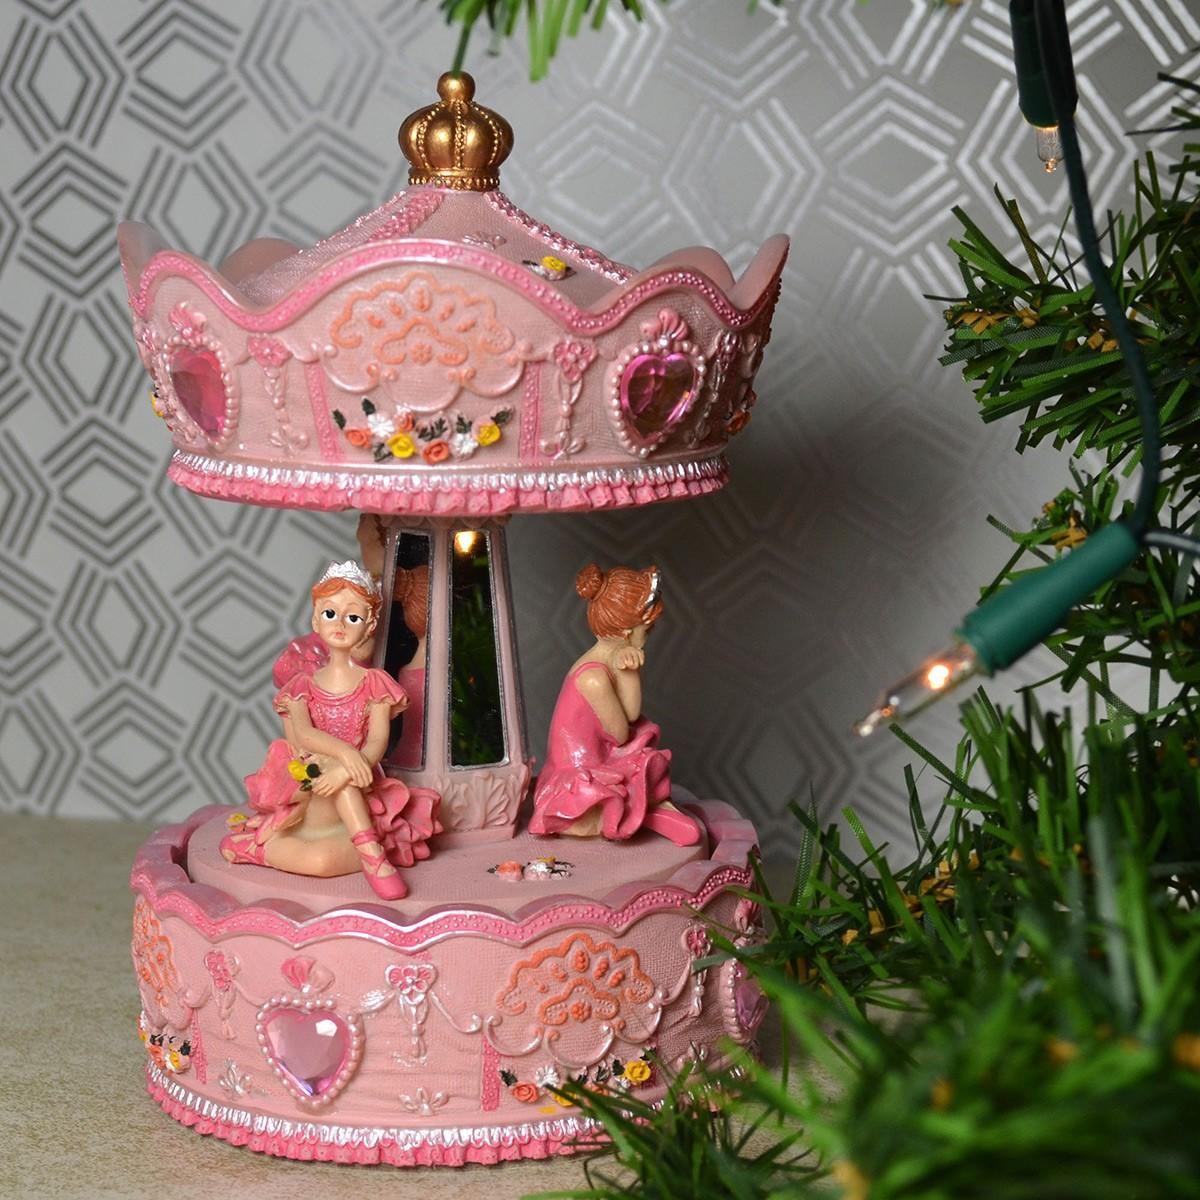 Mergi la Carusel Muzical - Balerine Roz